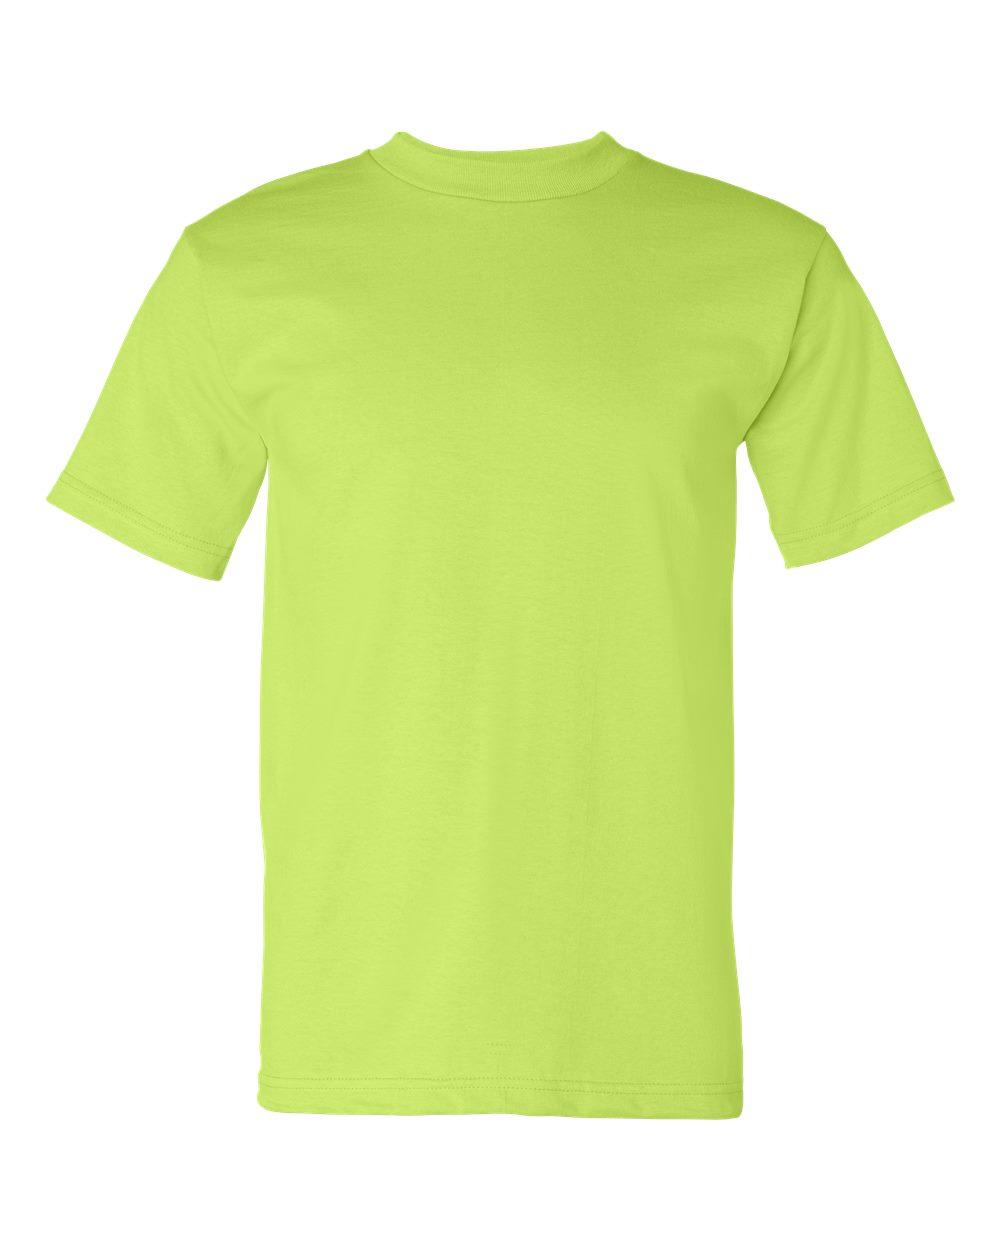 Bayside-Mens-Cotton-Blank-USA-Made-Short-Sleeve-T-Shirt-5100-up-to-5XL thumbnail 24